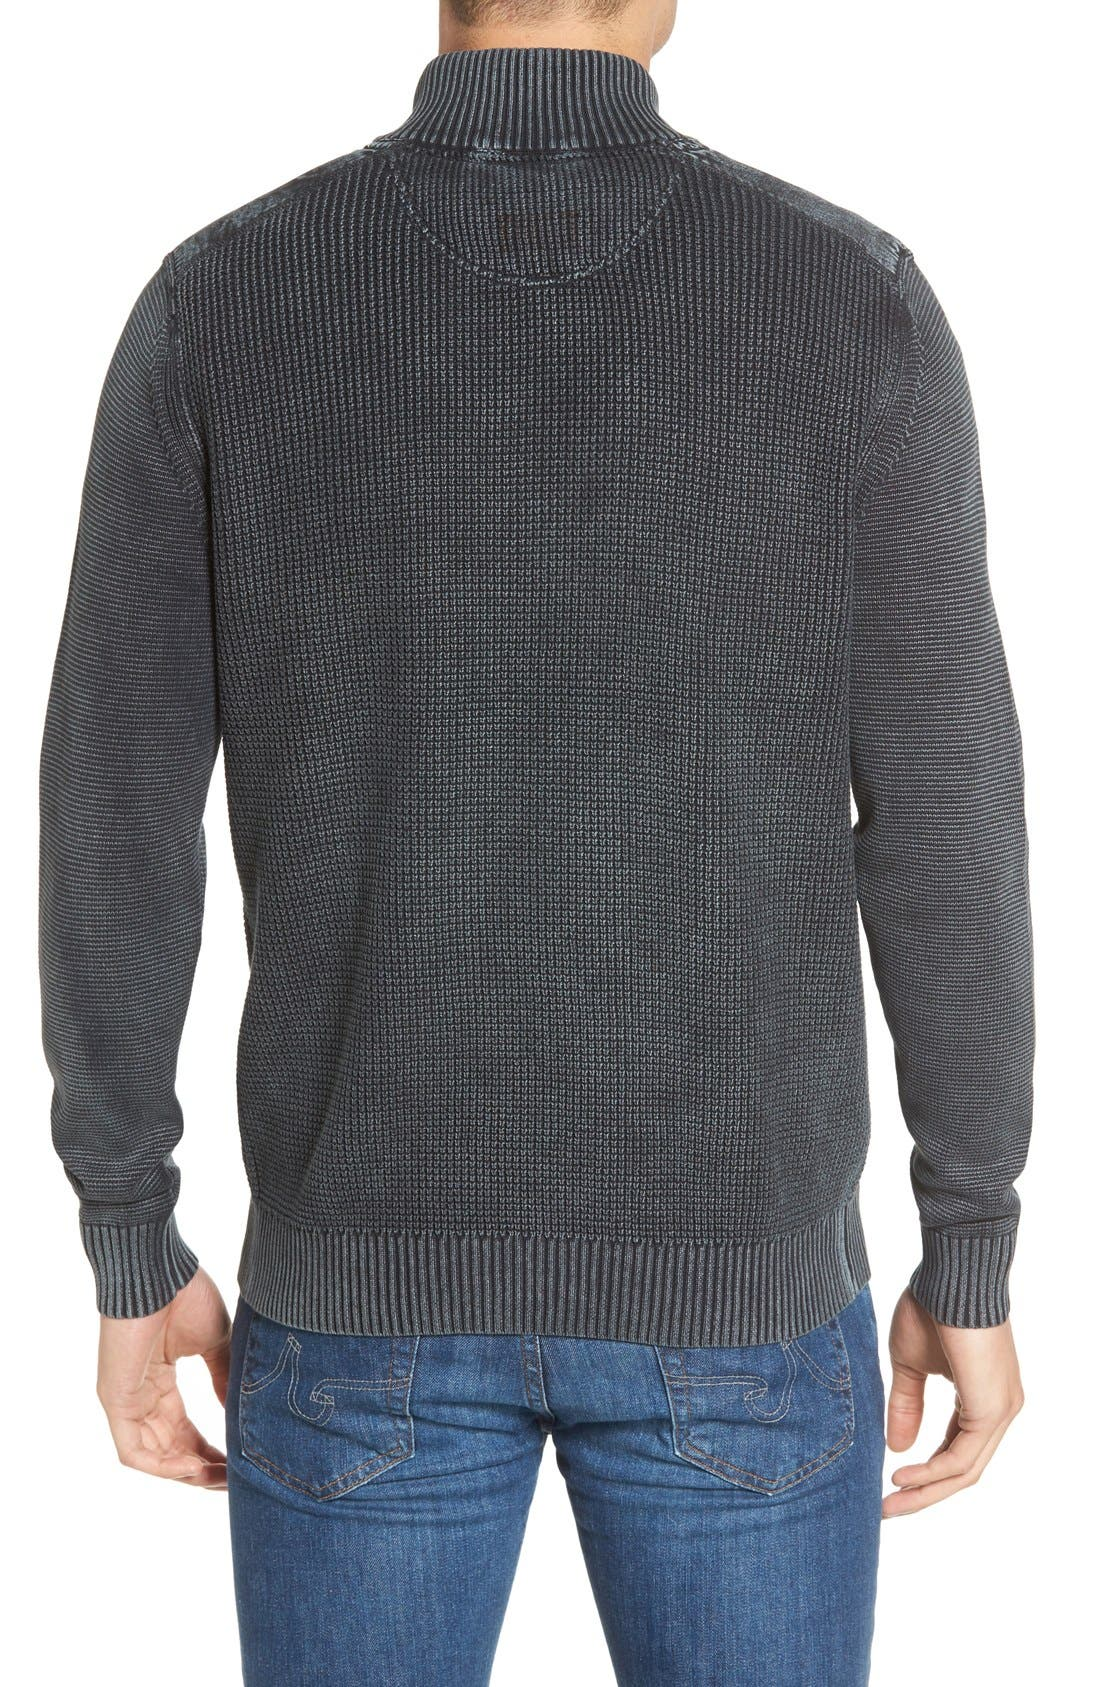 'Coastal Shores' Quarter Zip Sweater,                             Alternate thumbnail 13, color,